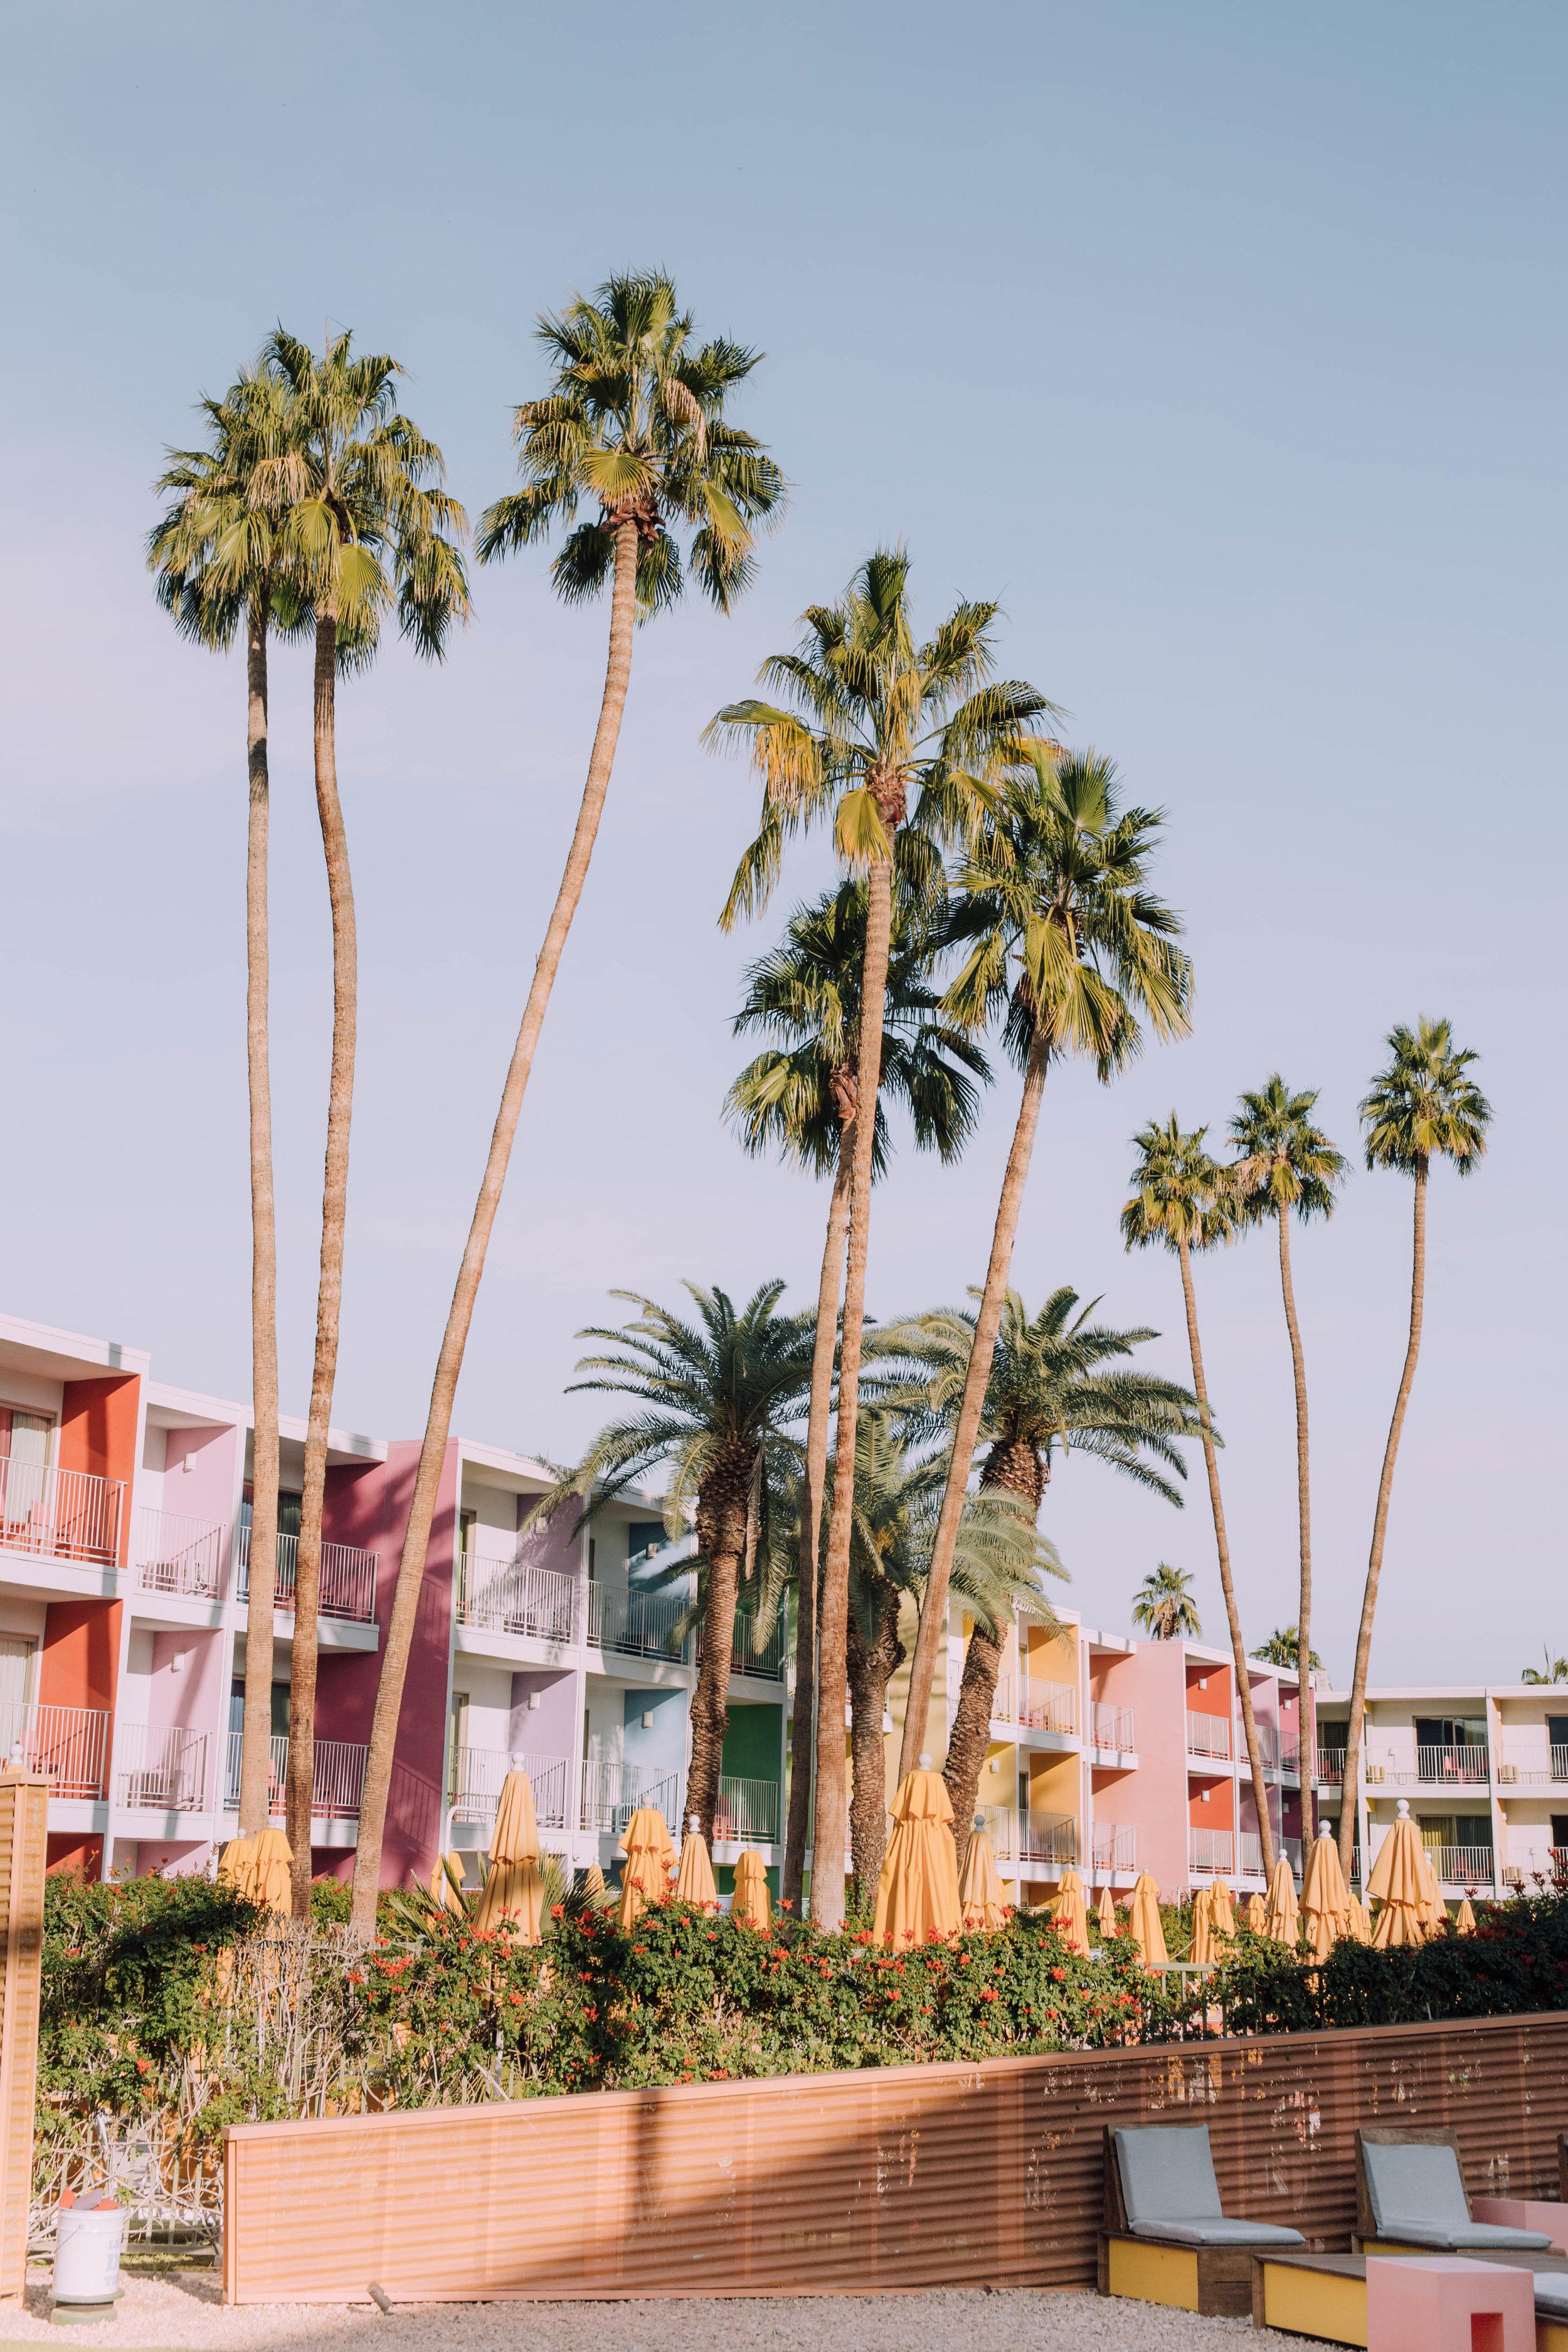 Palms at The Saguaro